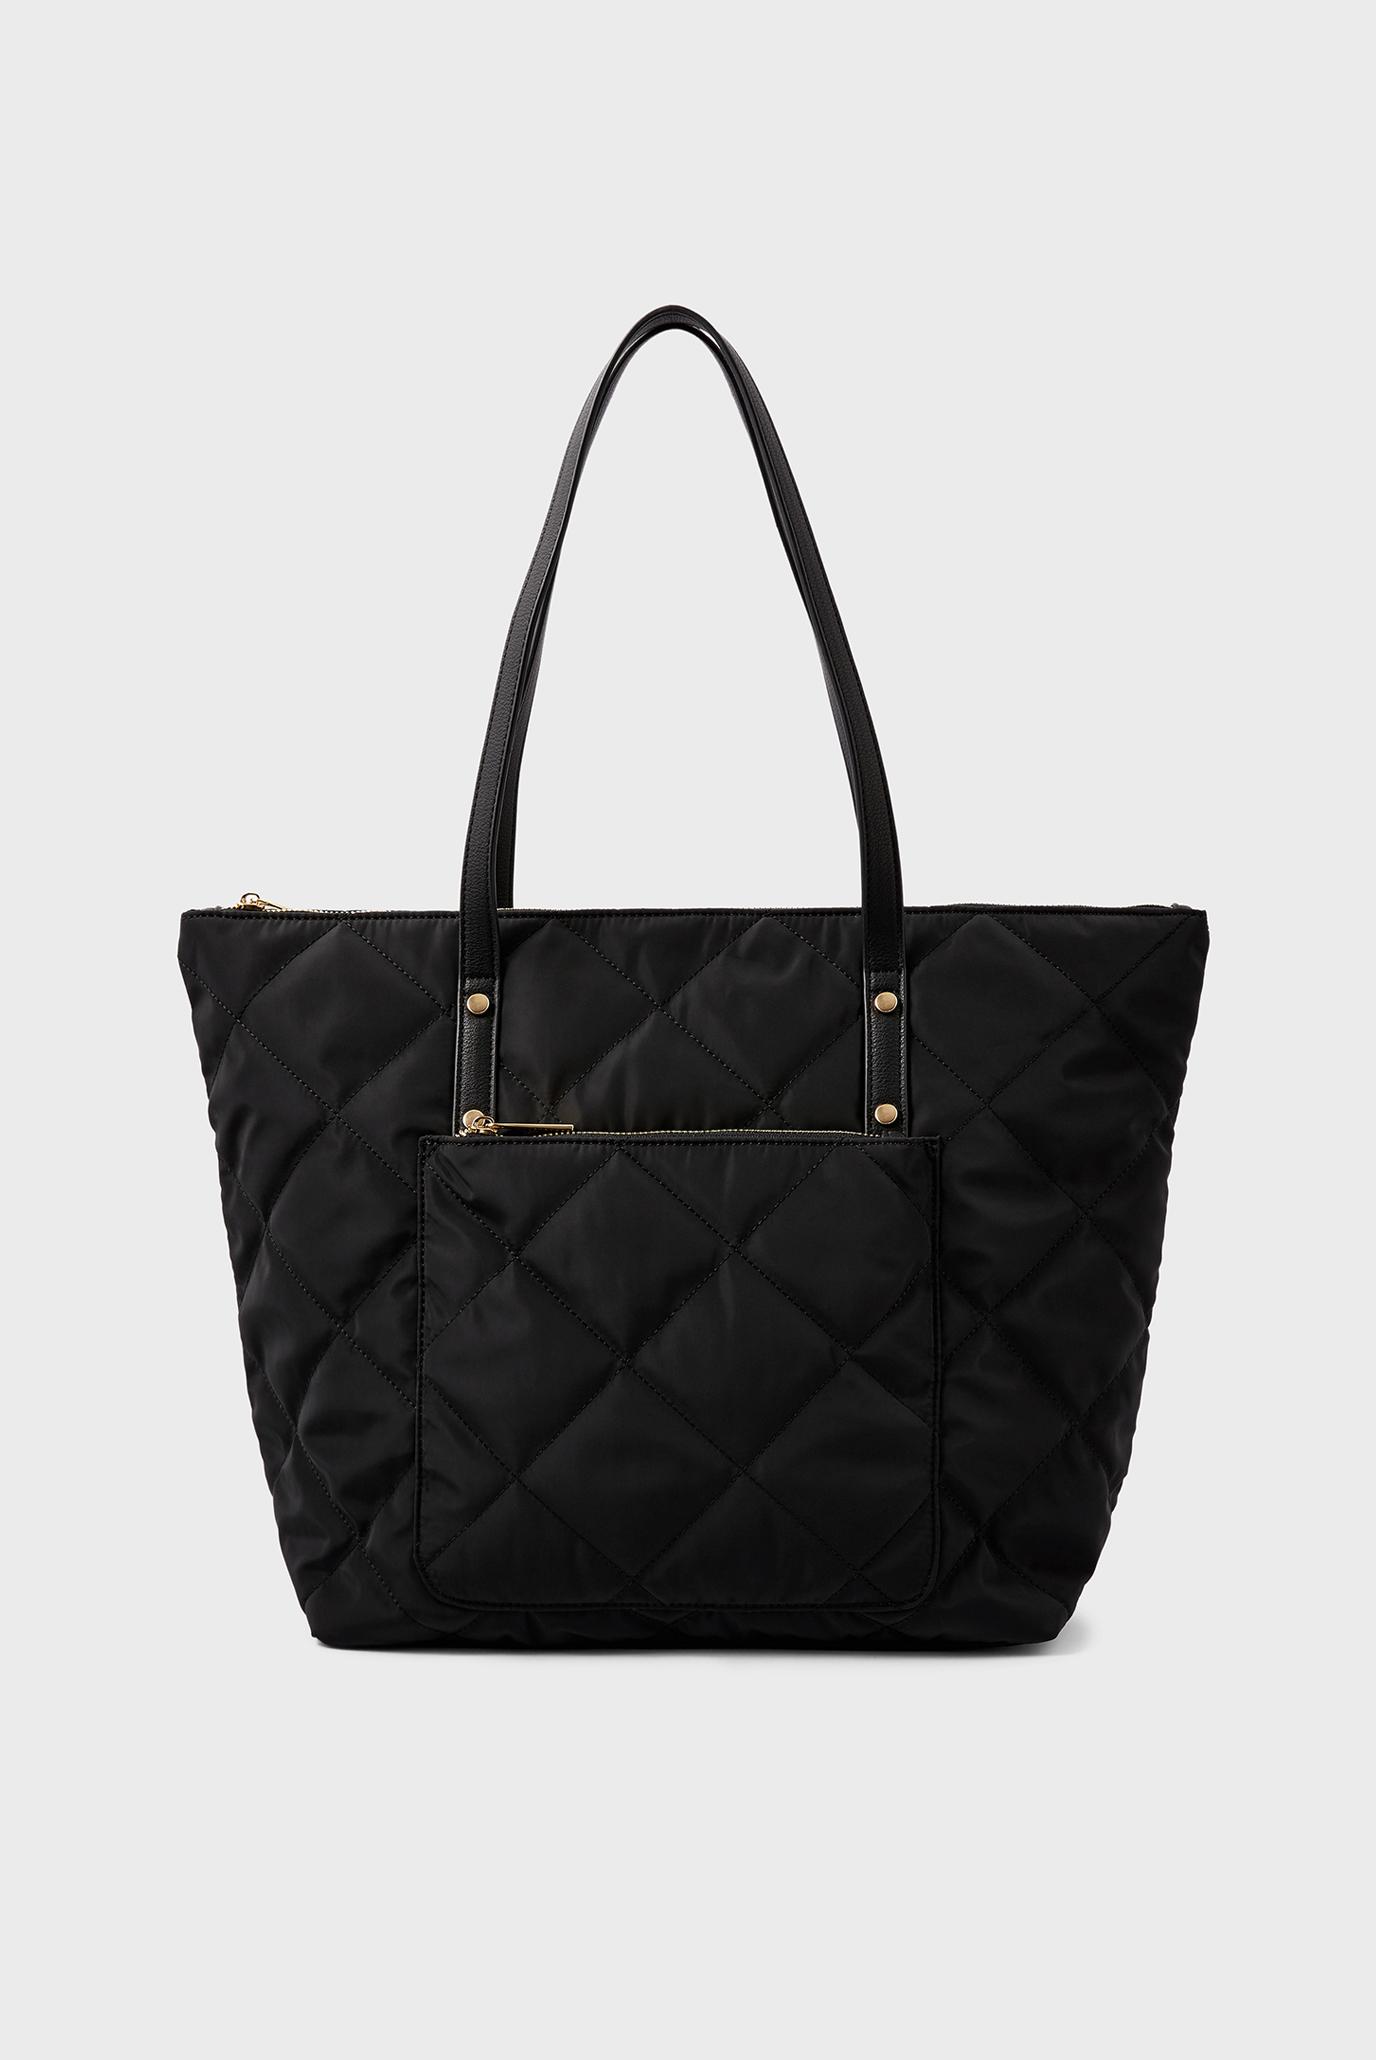 Женская черная сумка Tilly quilted 1